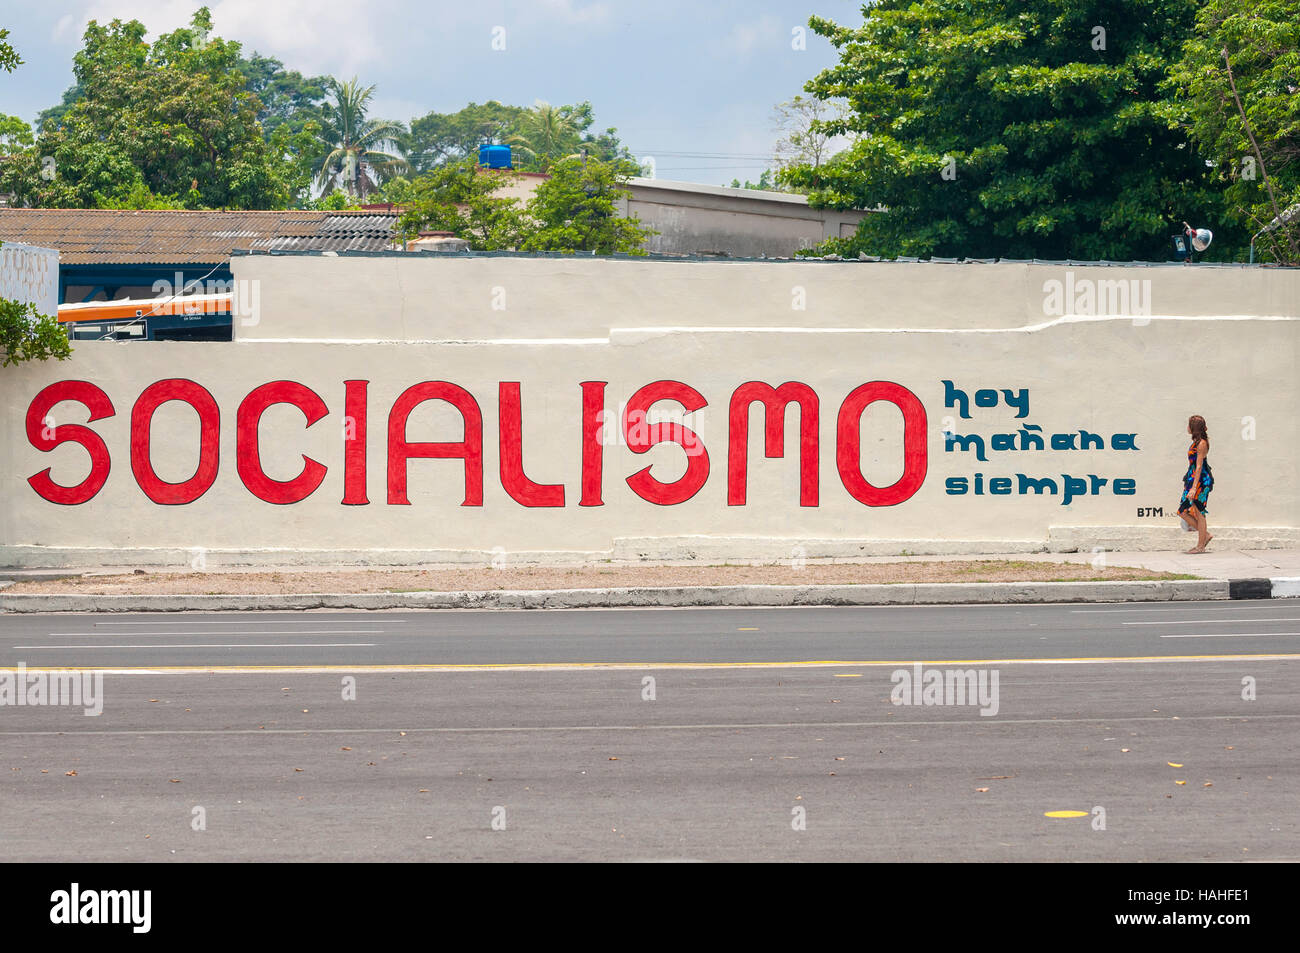 HAVANA, CUBA - JUNE, 2011: Propaganda mural promotes Socialism (today, tomorrow, always) on a street in Centro. - Stock Image